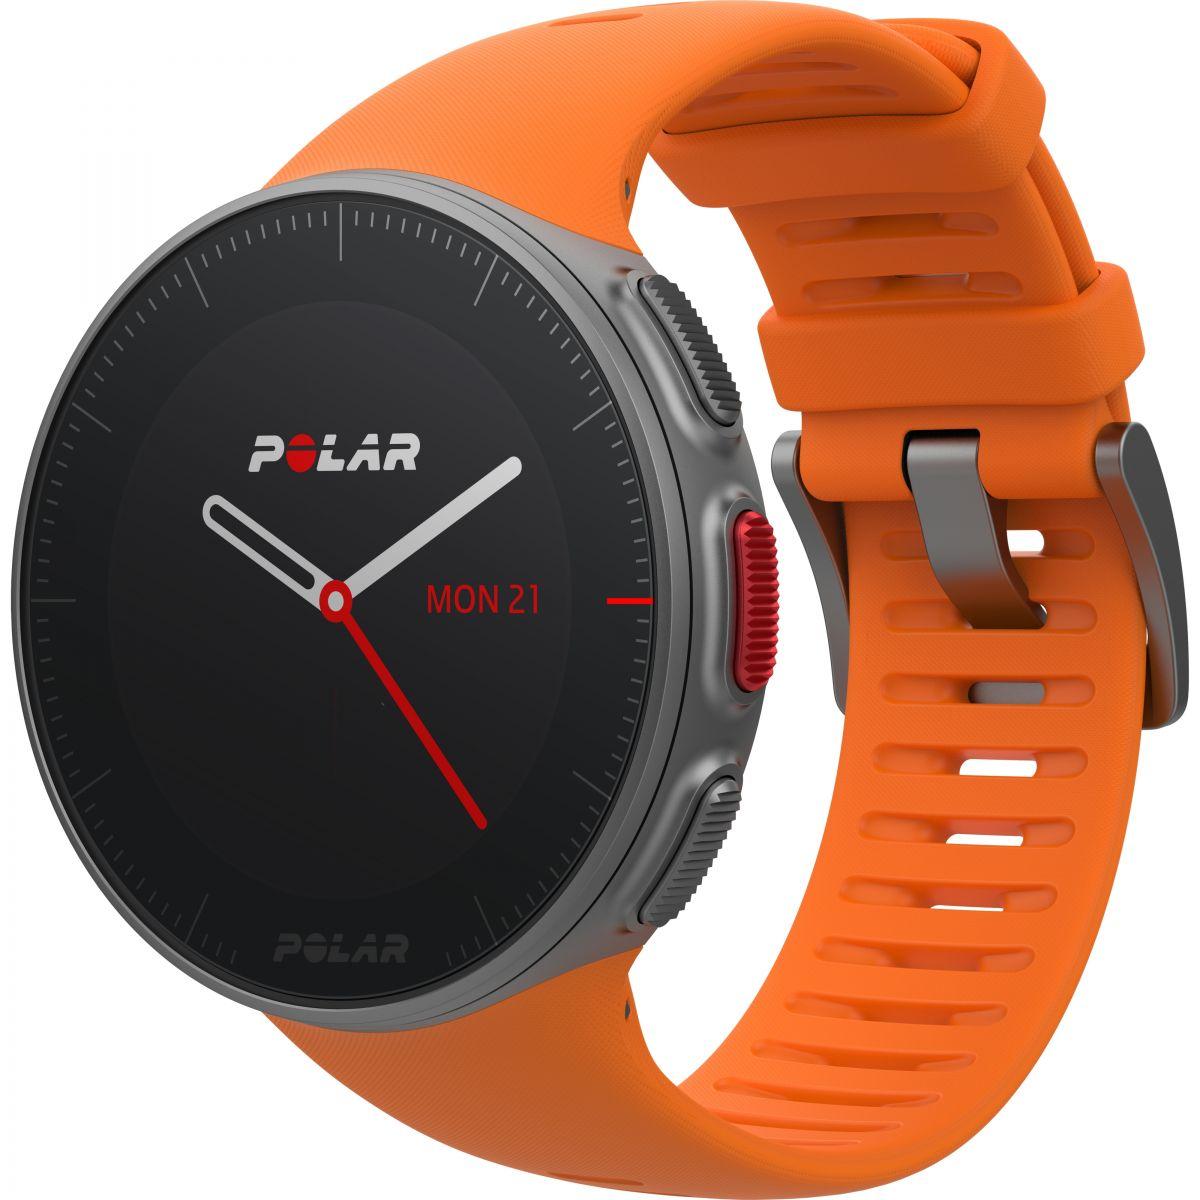 Мультиспортивные часы Polar Vantage V orange